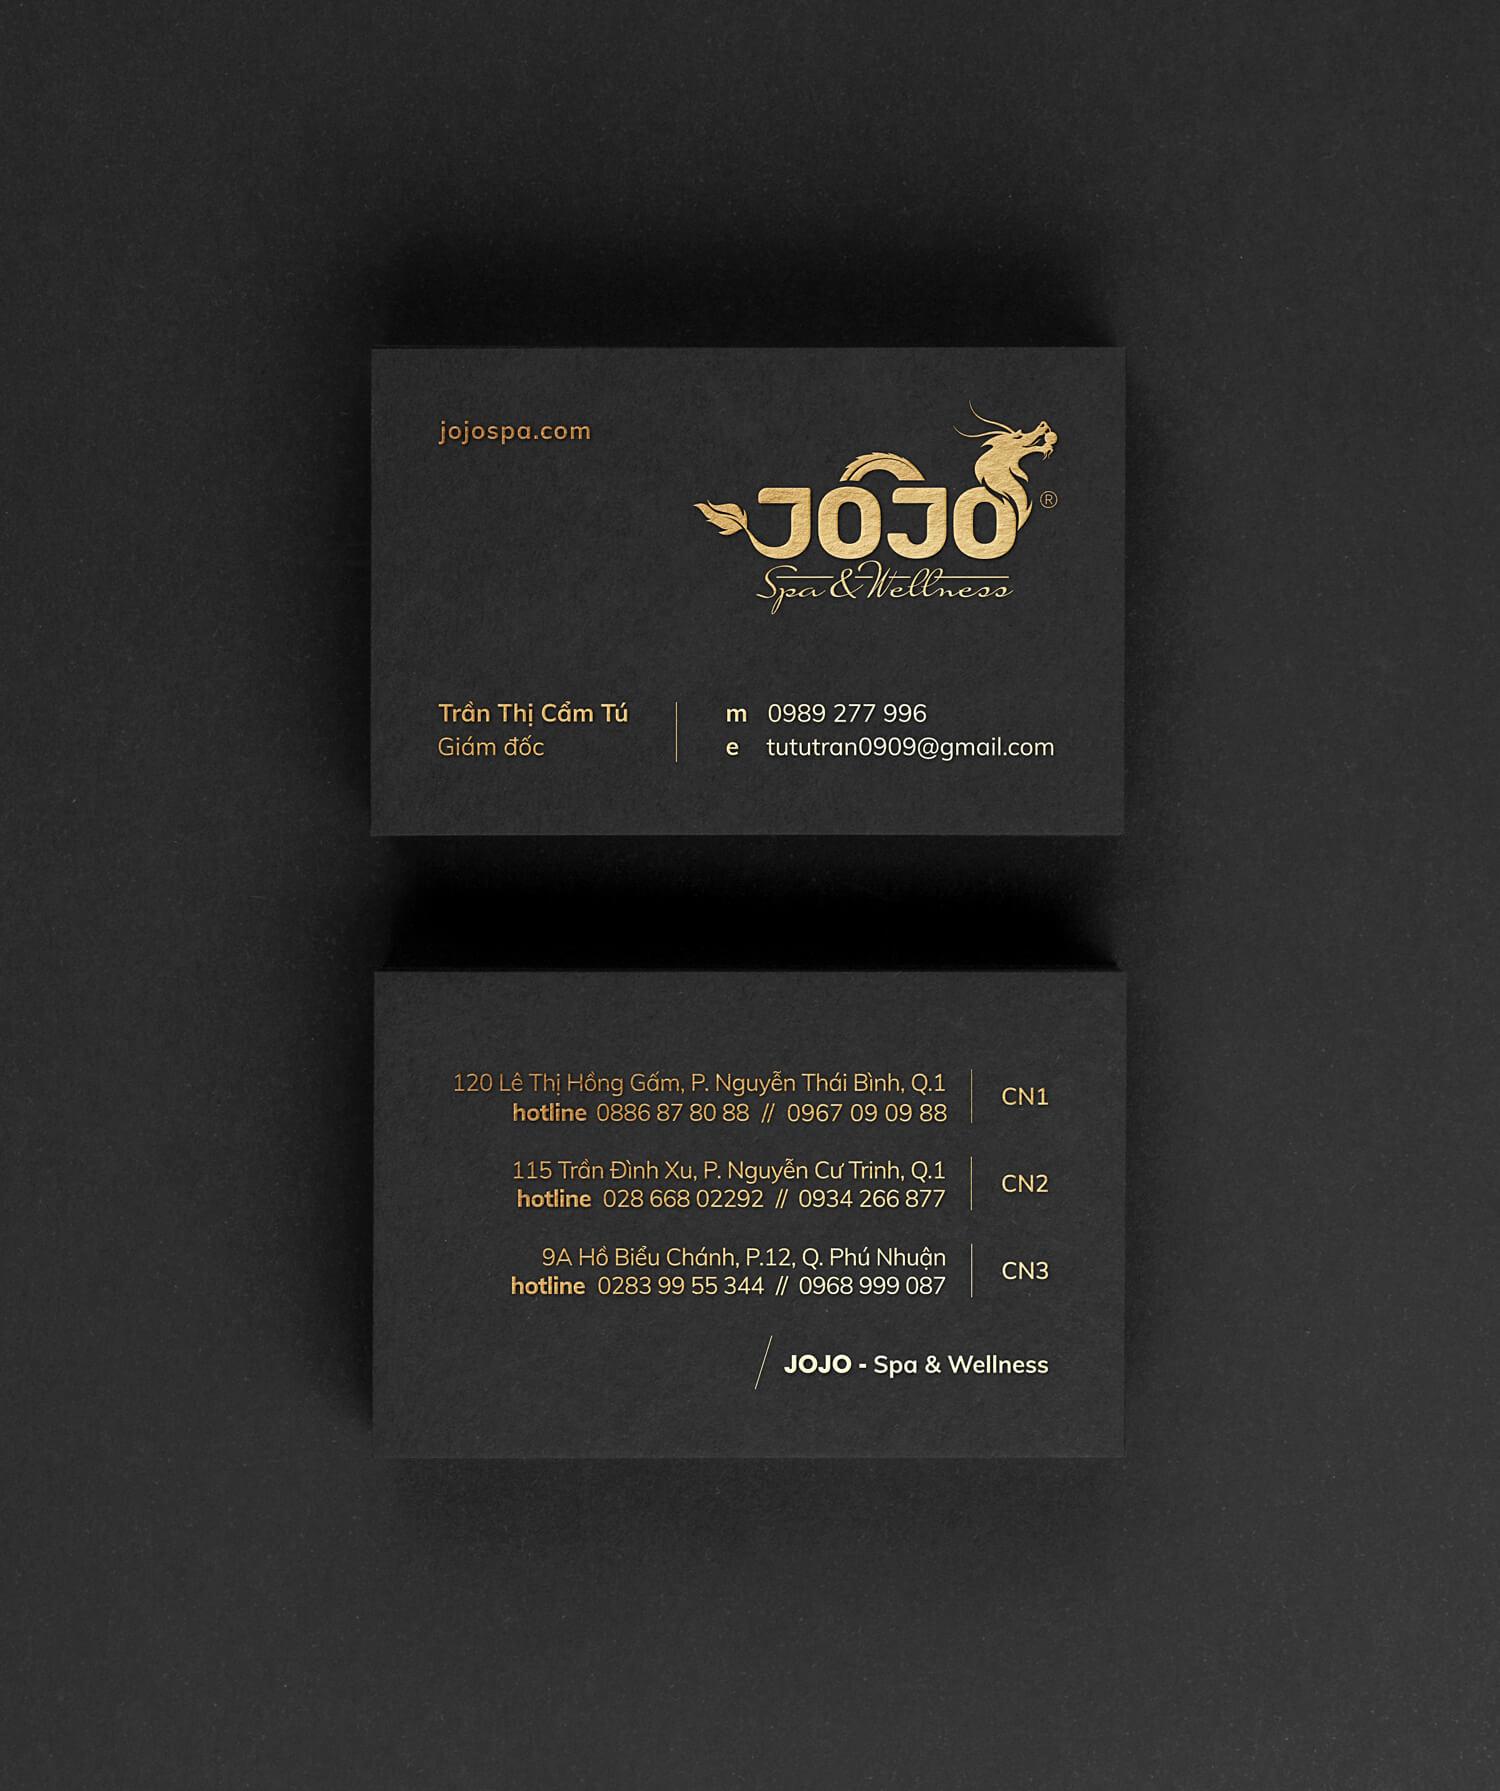 thiet-ke-logo-chuyen-nghiep-Jojo-spa-&-wellness-5